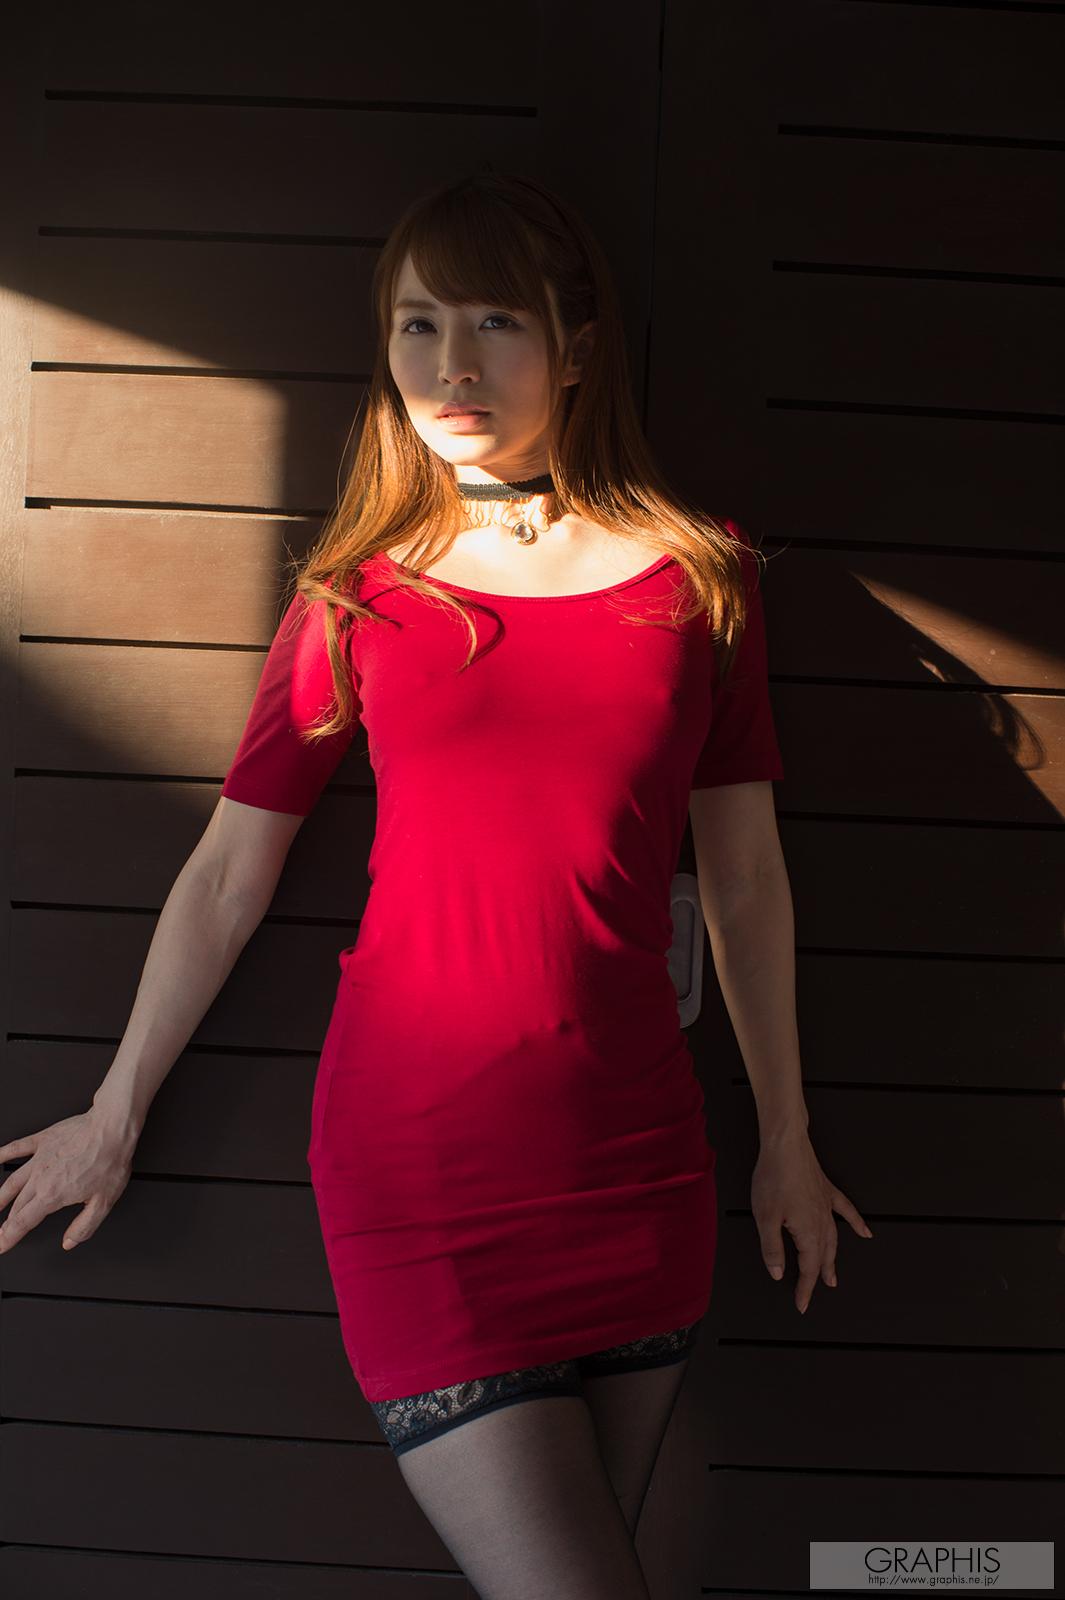 Miku Ohashi 大橋未久 | Top Girl Model Naked | Gravure Girls Idols